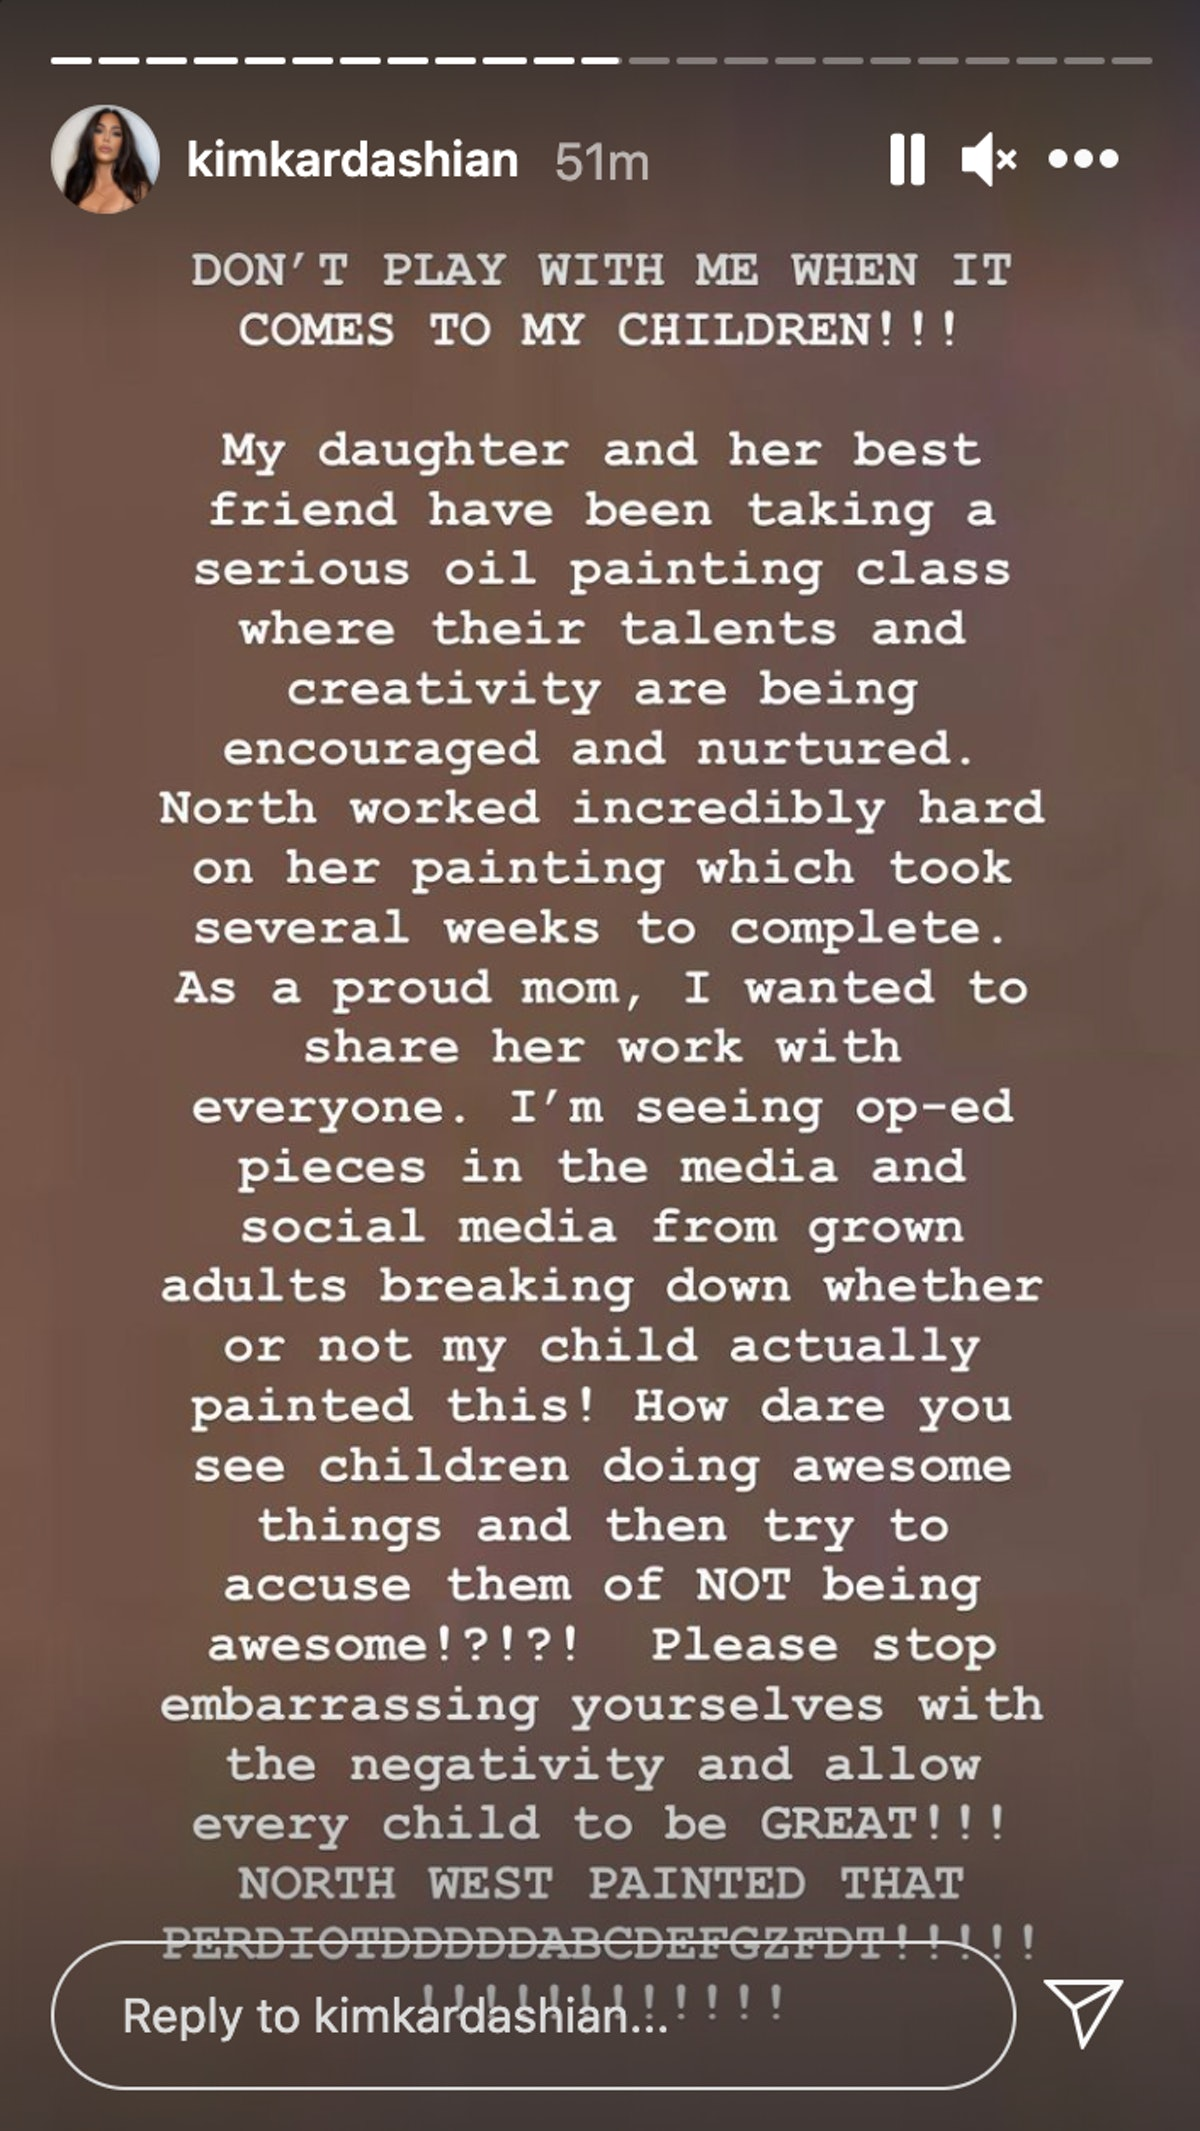 kim kardashian instagram story screenshot